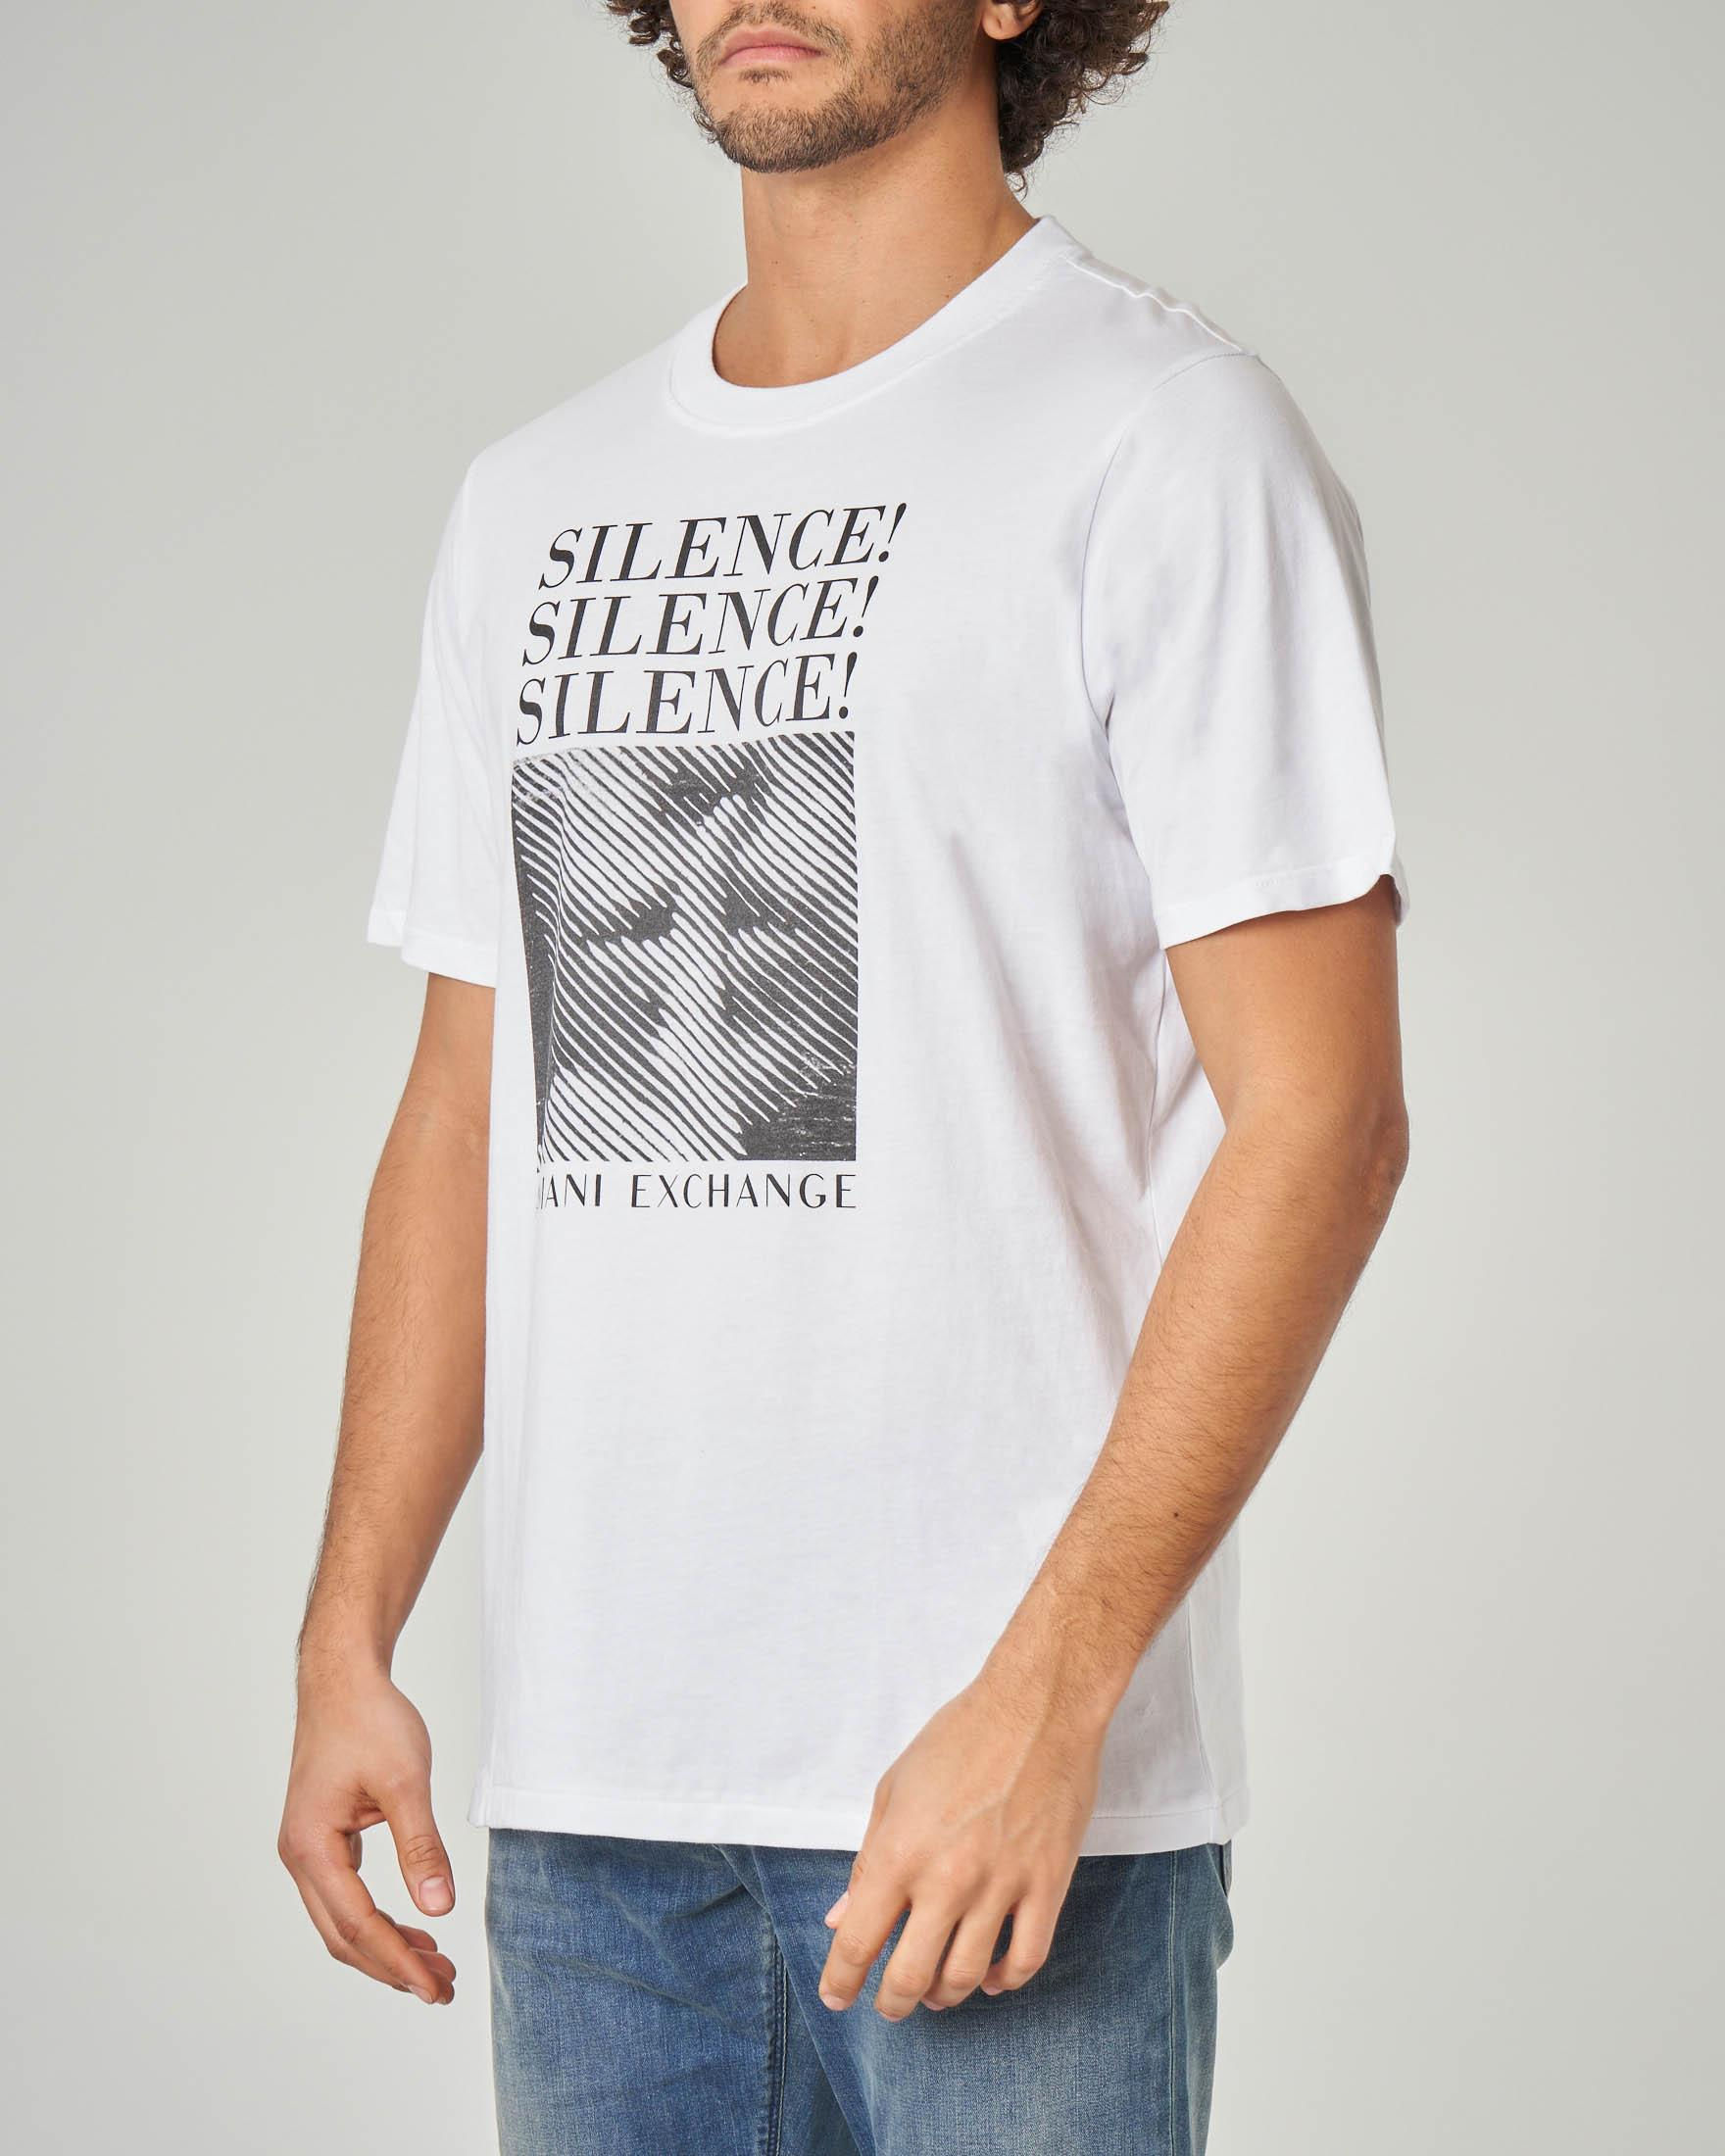 T-shirt bianca con stampa e scritte